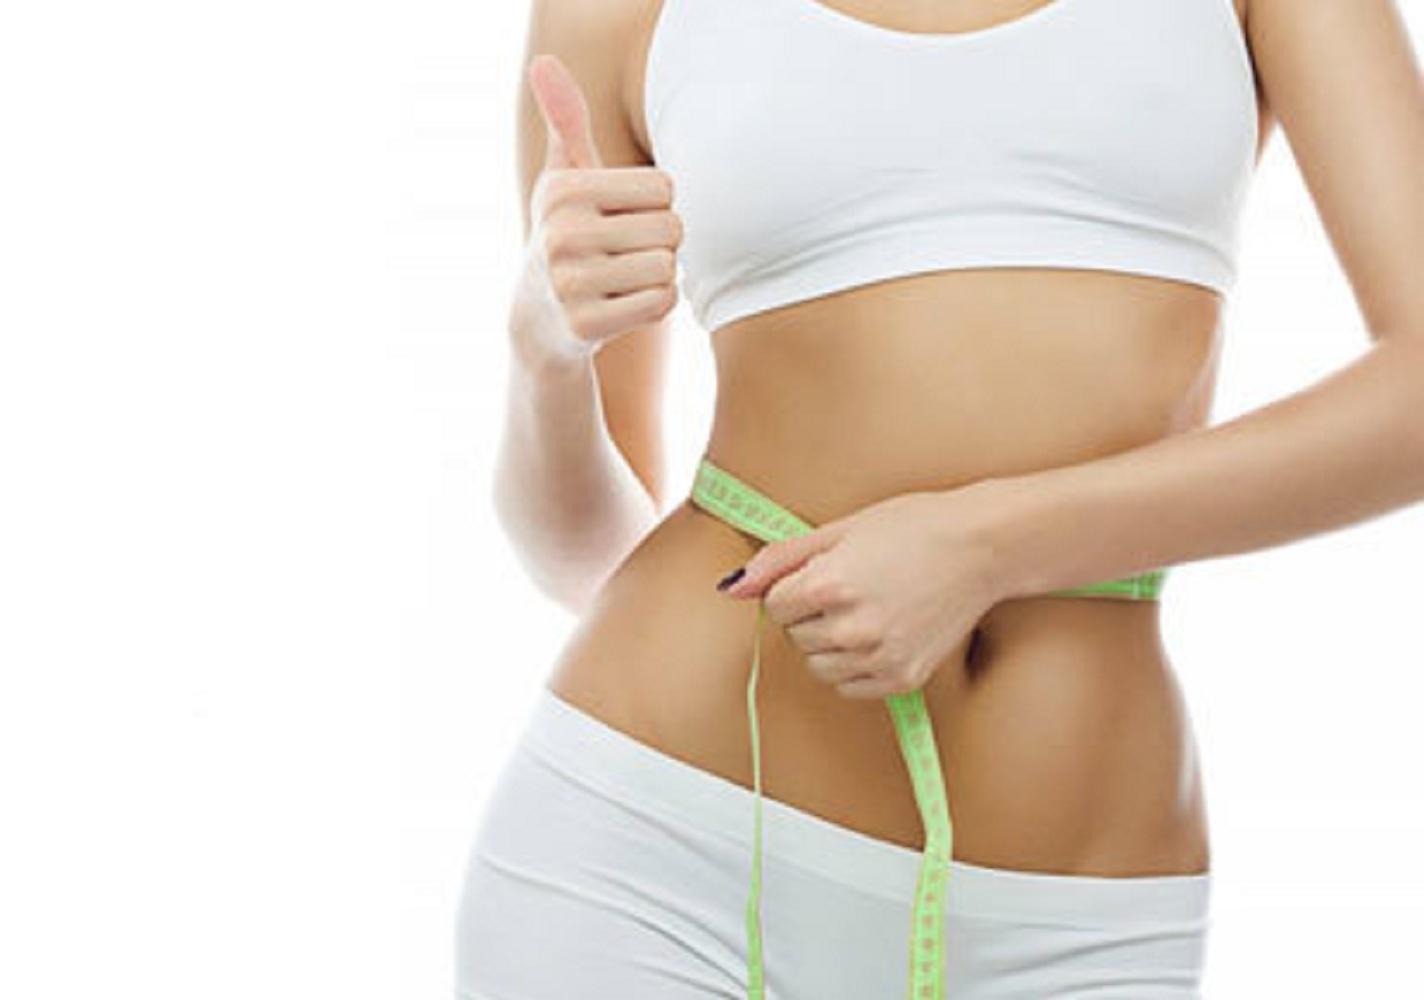 pierde grăsime sub ombilic bcm 95 pierdere in greutate